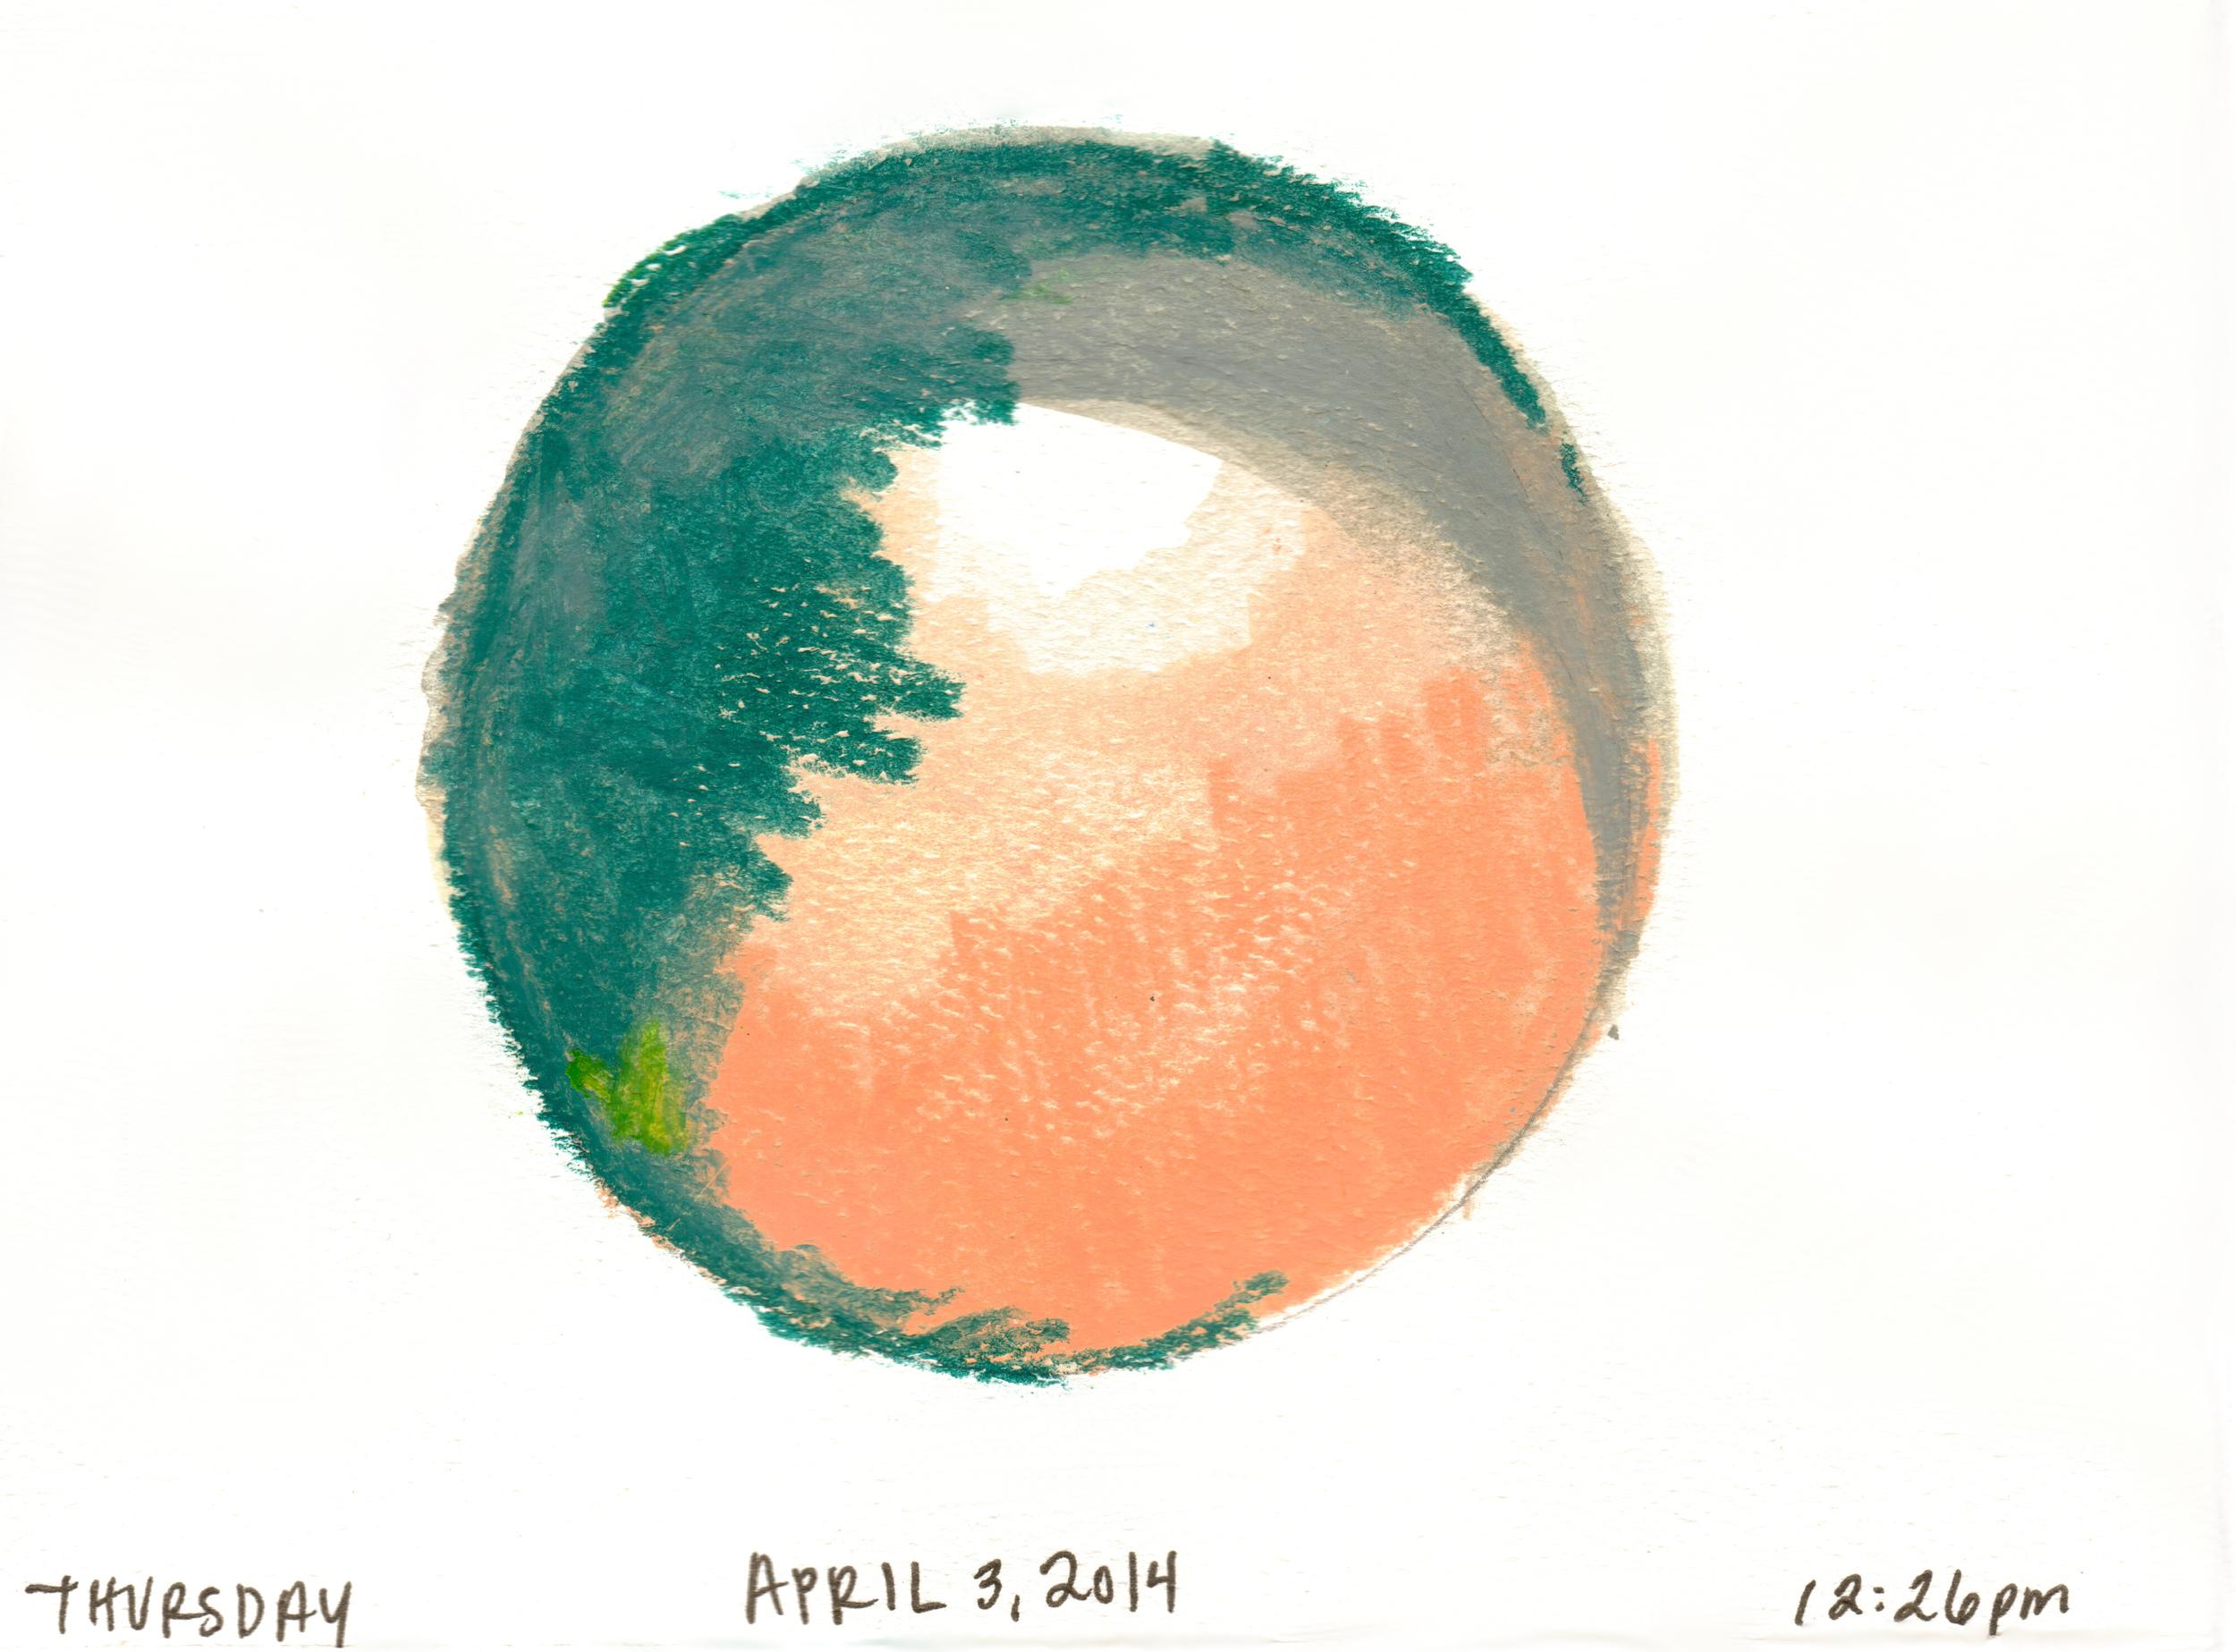 04.04.14